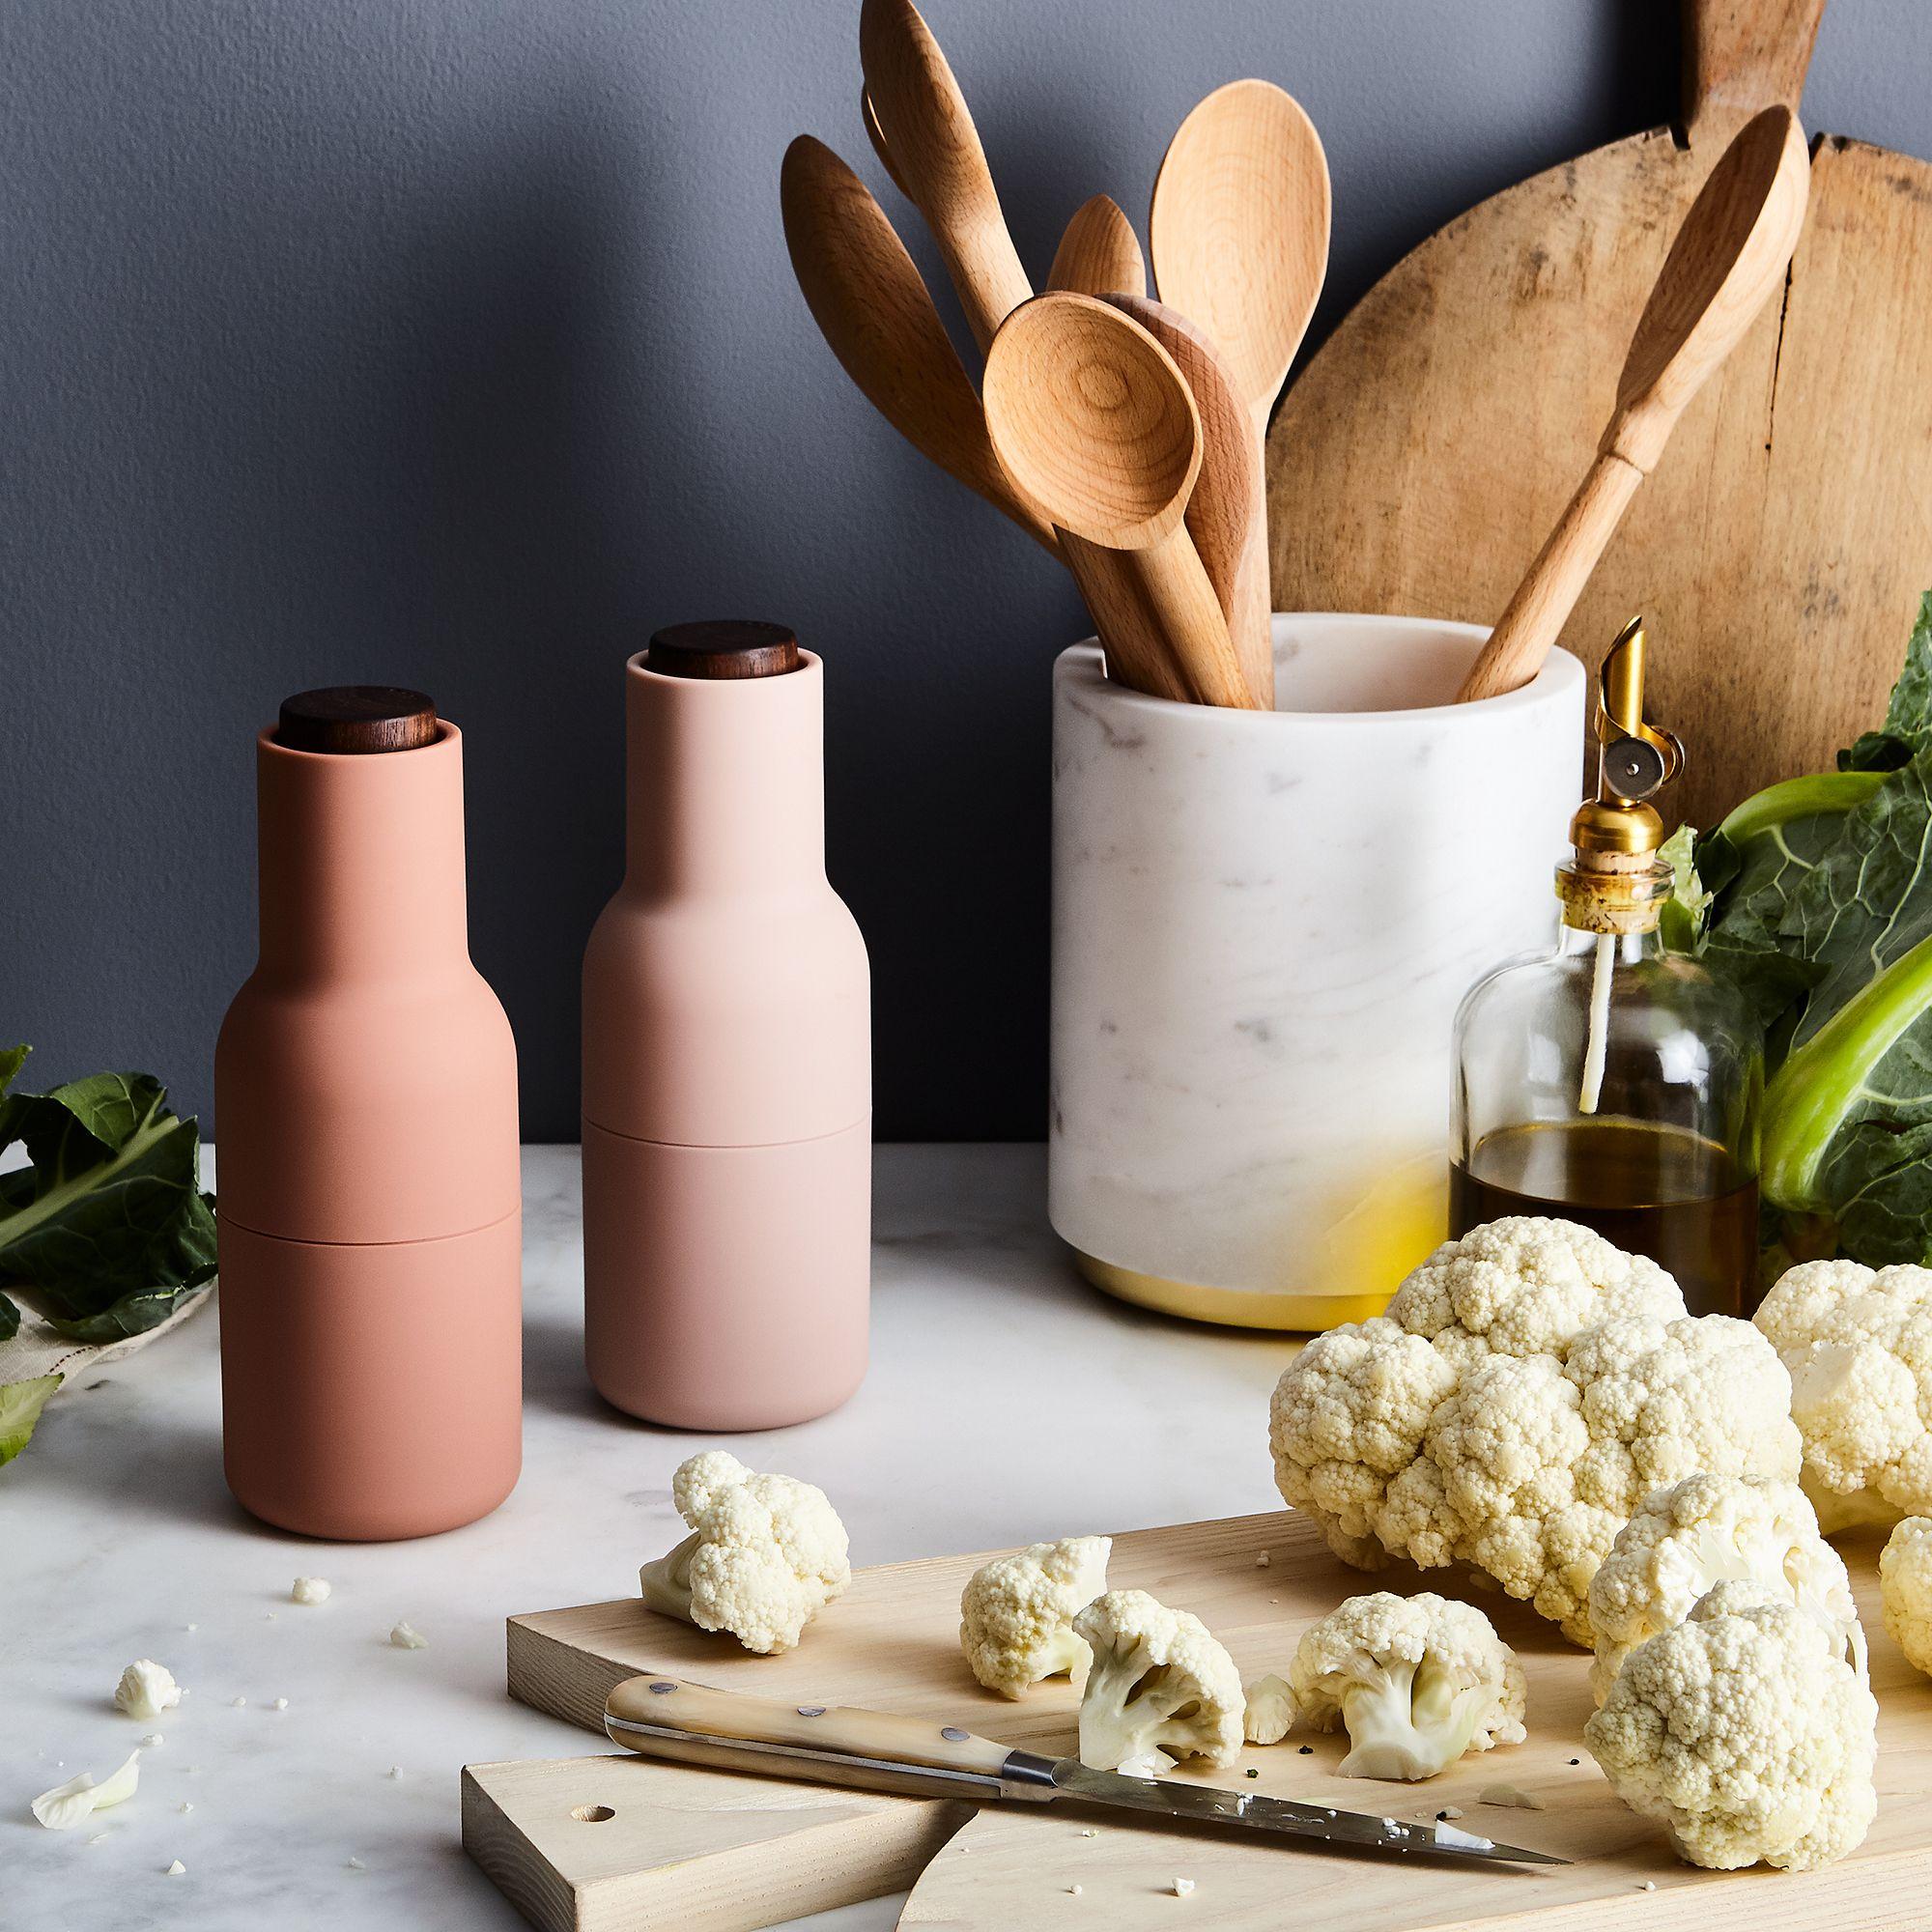 05d90c21-4f3f-4550-a554-be6836e9601a–2017-1110_menu_salt-and-pepper-bottle-grinders-with-walnut-lids_nudes_mid_rocky-luten_010